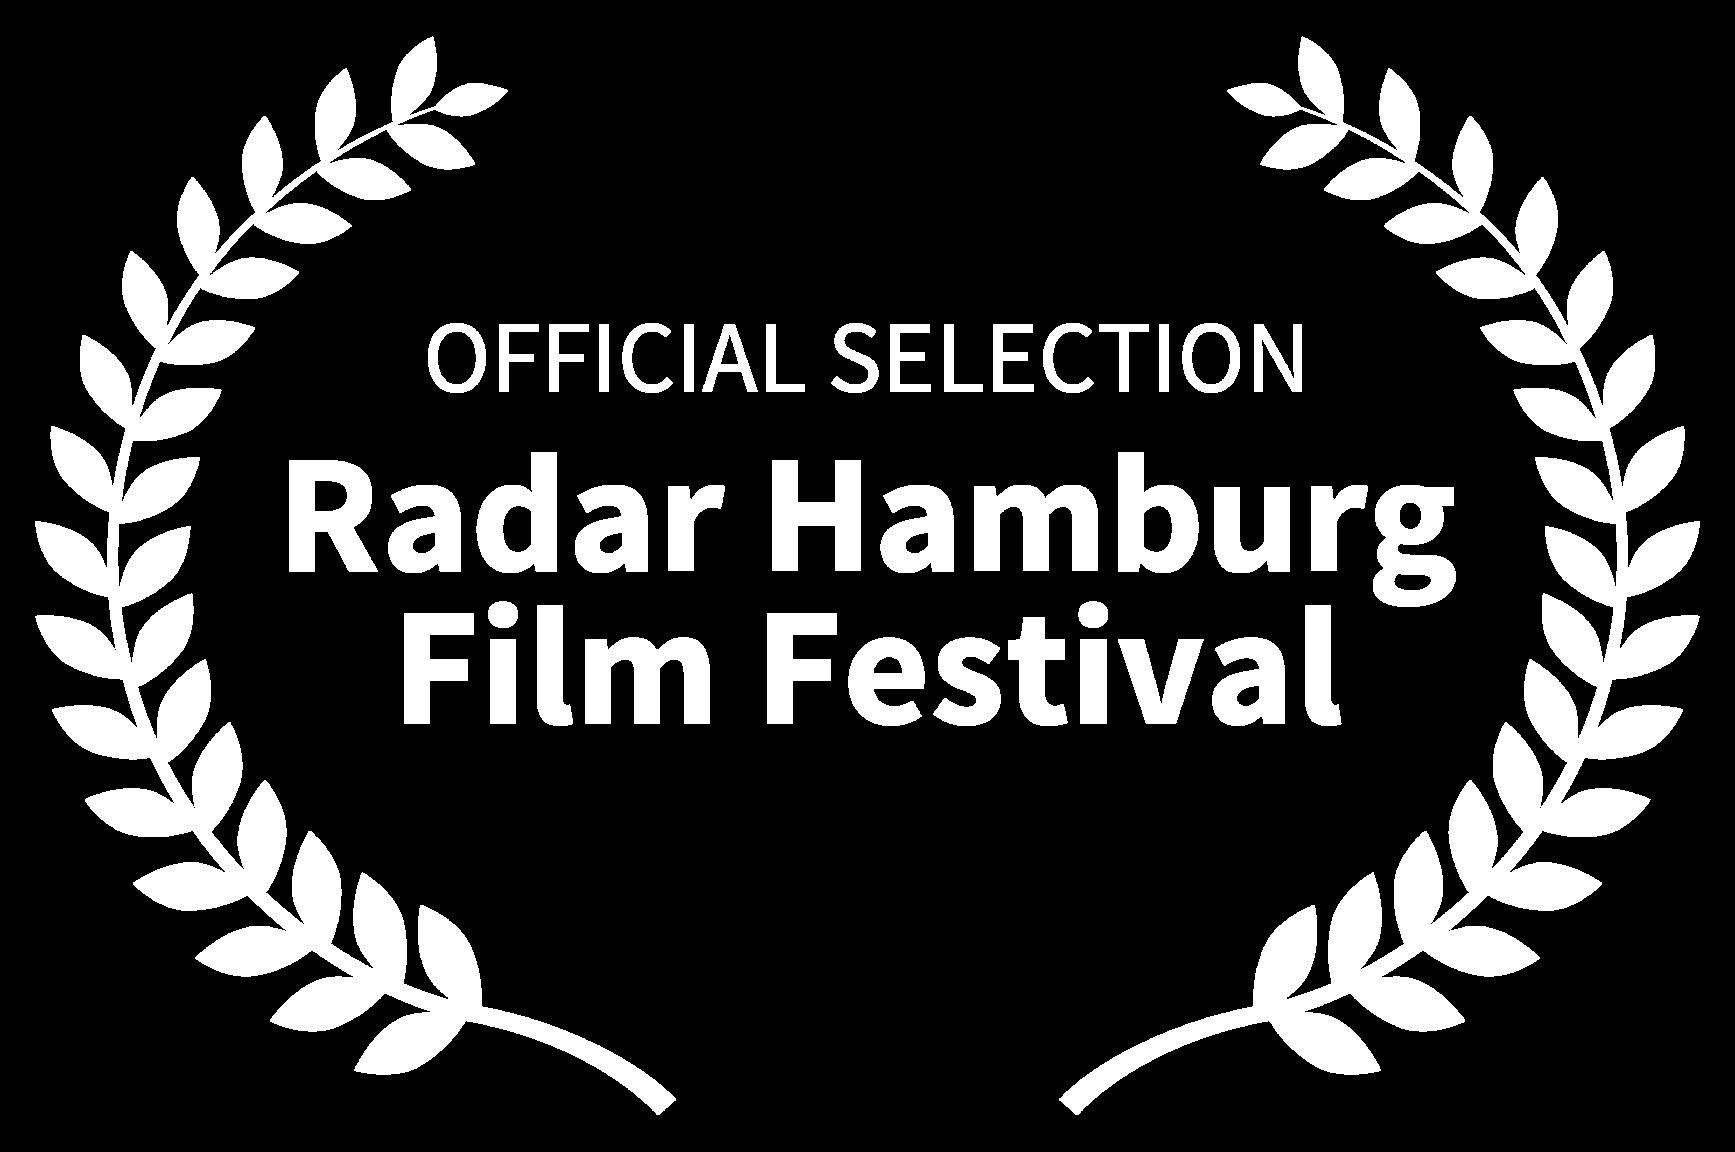 OFFICIAL SELECTION - Radar Hamburg Film Festival